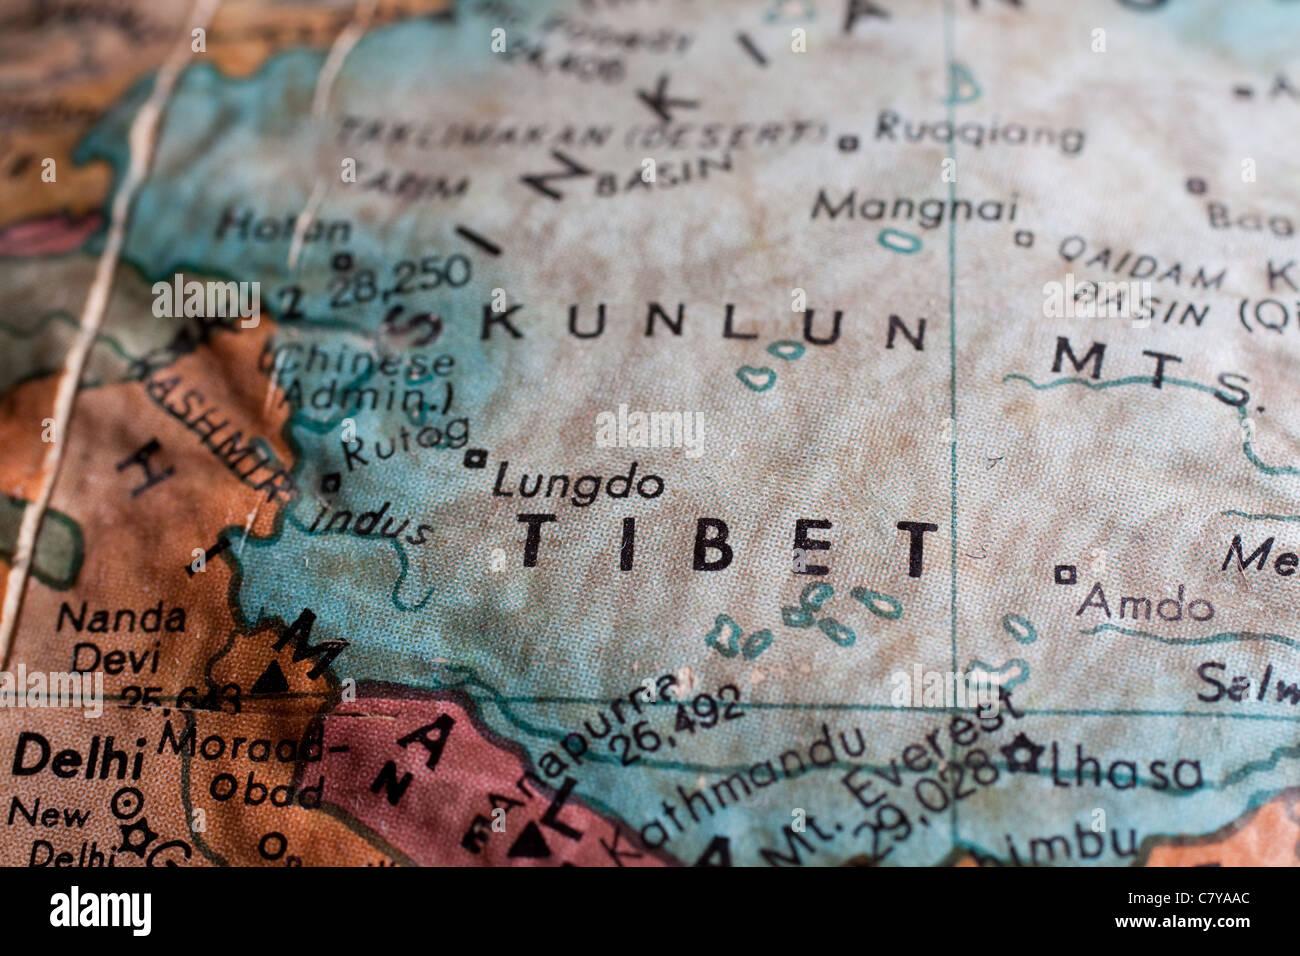 Kunlun Mountains Tibet Stock Photos & Kunlun Mountains Tibet Stock on gobi desert map, mount tai, ural mountains map, sacred mountains of china, tian shan mountains map, altay mountains, tarim basin map, qinling mountains, kolyma mountains map, baekdu mountain, gobi desert, tarim basin, muztagh ata, altay mountains map, qinling shandi mountains map, amur river map, mount hua, alps mountains map, hindu kush, brahmaputra river map, tien shan mountains map, east asia map, mount emei, tibetan plateau, taklamakan desert map, zagros mountains map, altai mountains map, mountains in asia map, tian shan, deccan plateau map, china map, mt everest on map, pamir mountains, wudang mountains, great dividing range mountains map,